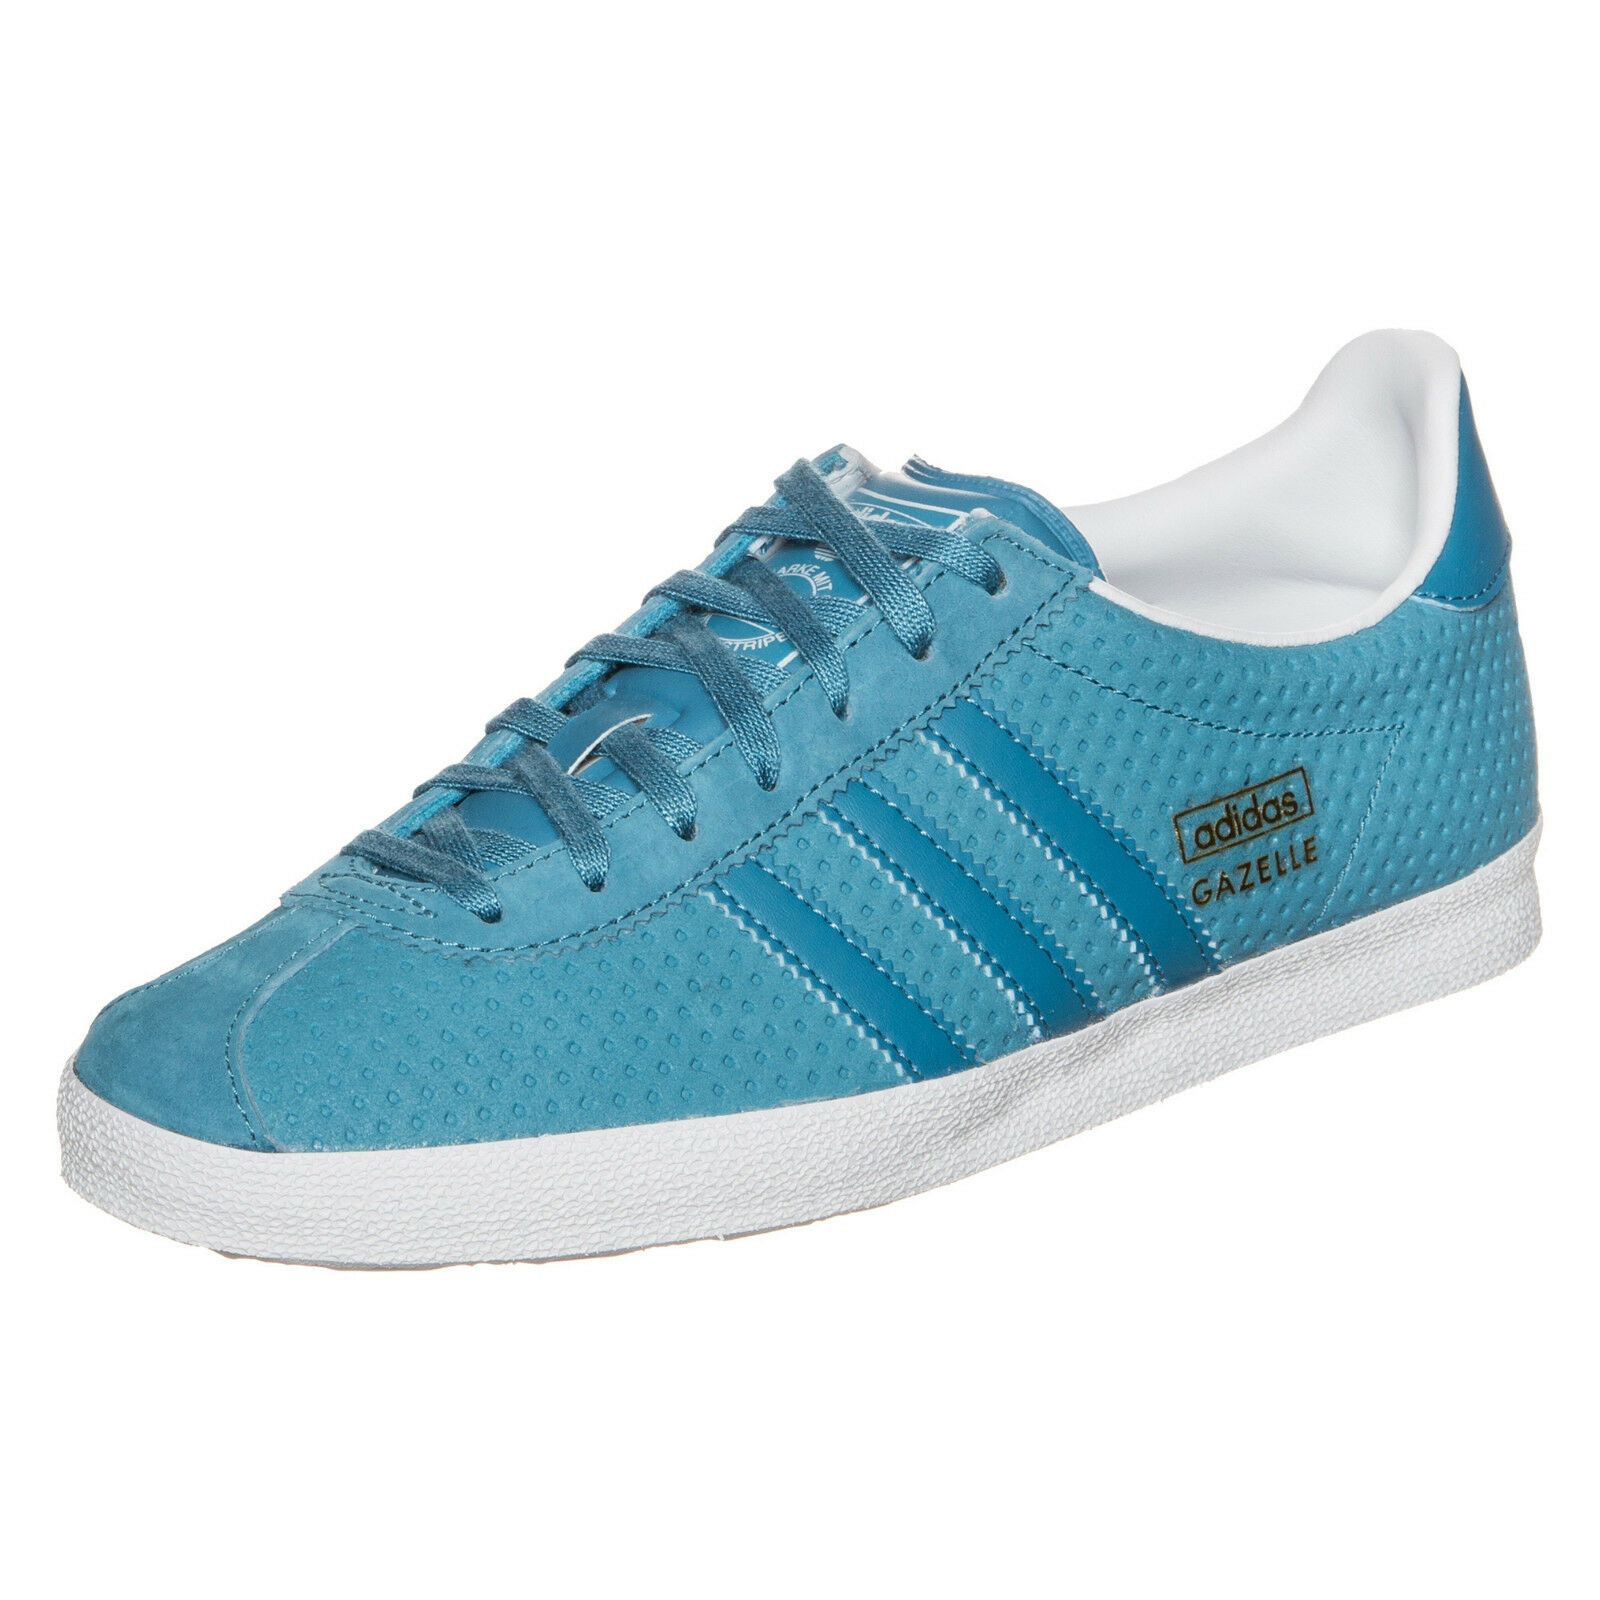 Adidas Originales Gazelle OG W S78880 Azul Cielo Mujer Para Mujer Cielo Zapatillas 50ae8e